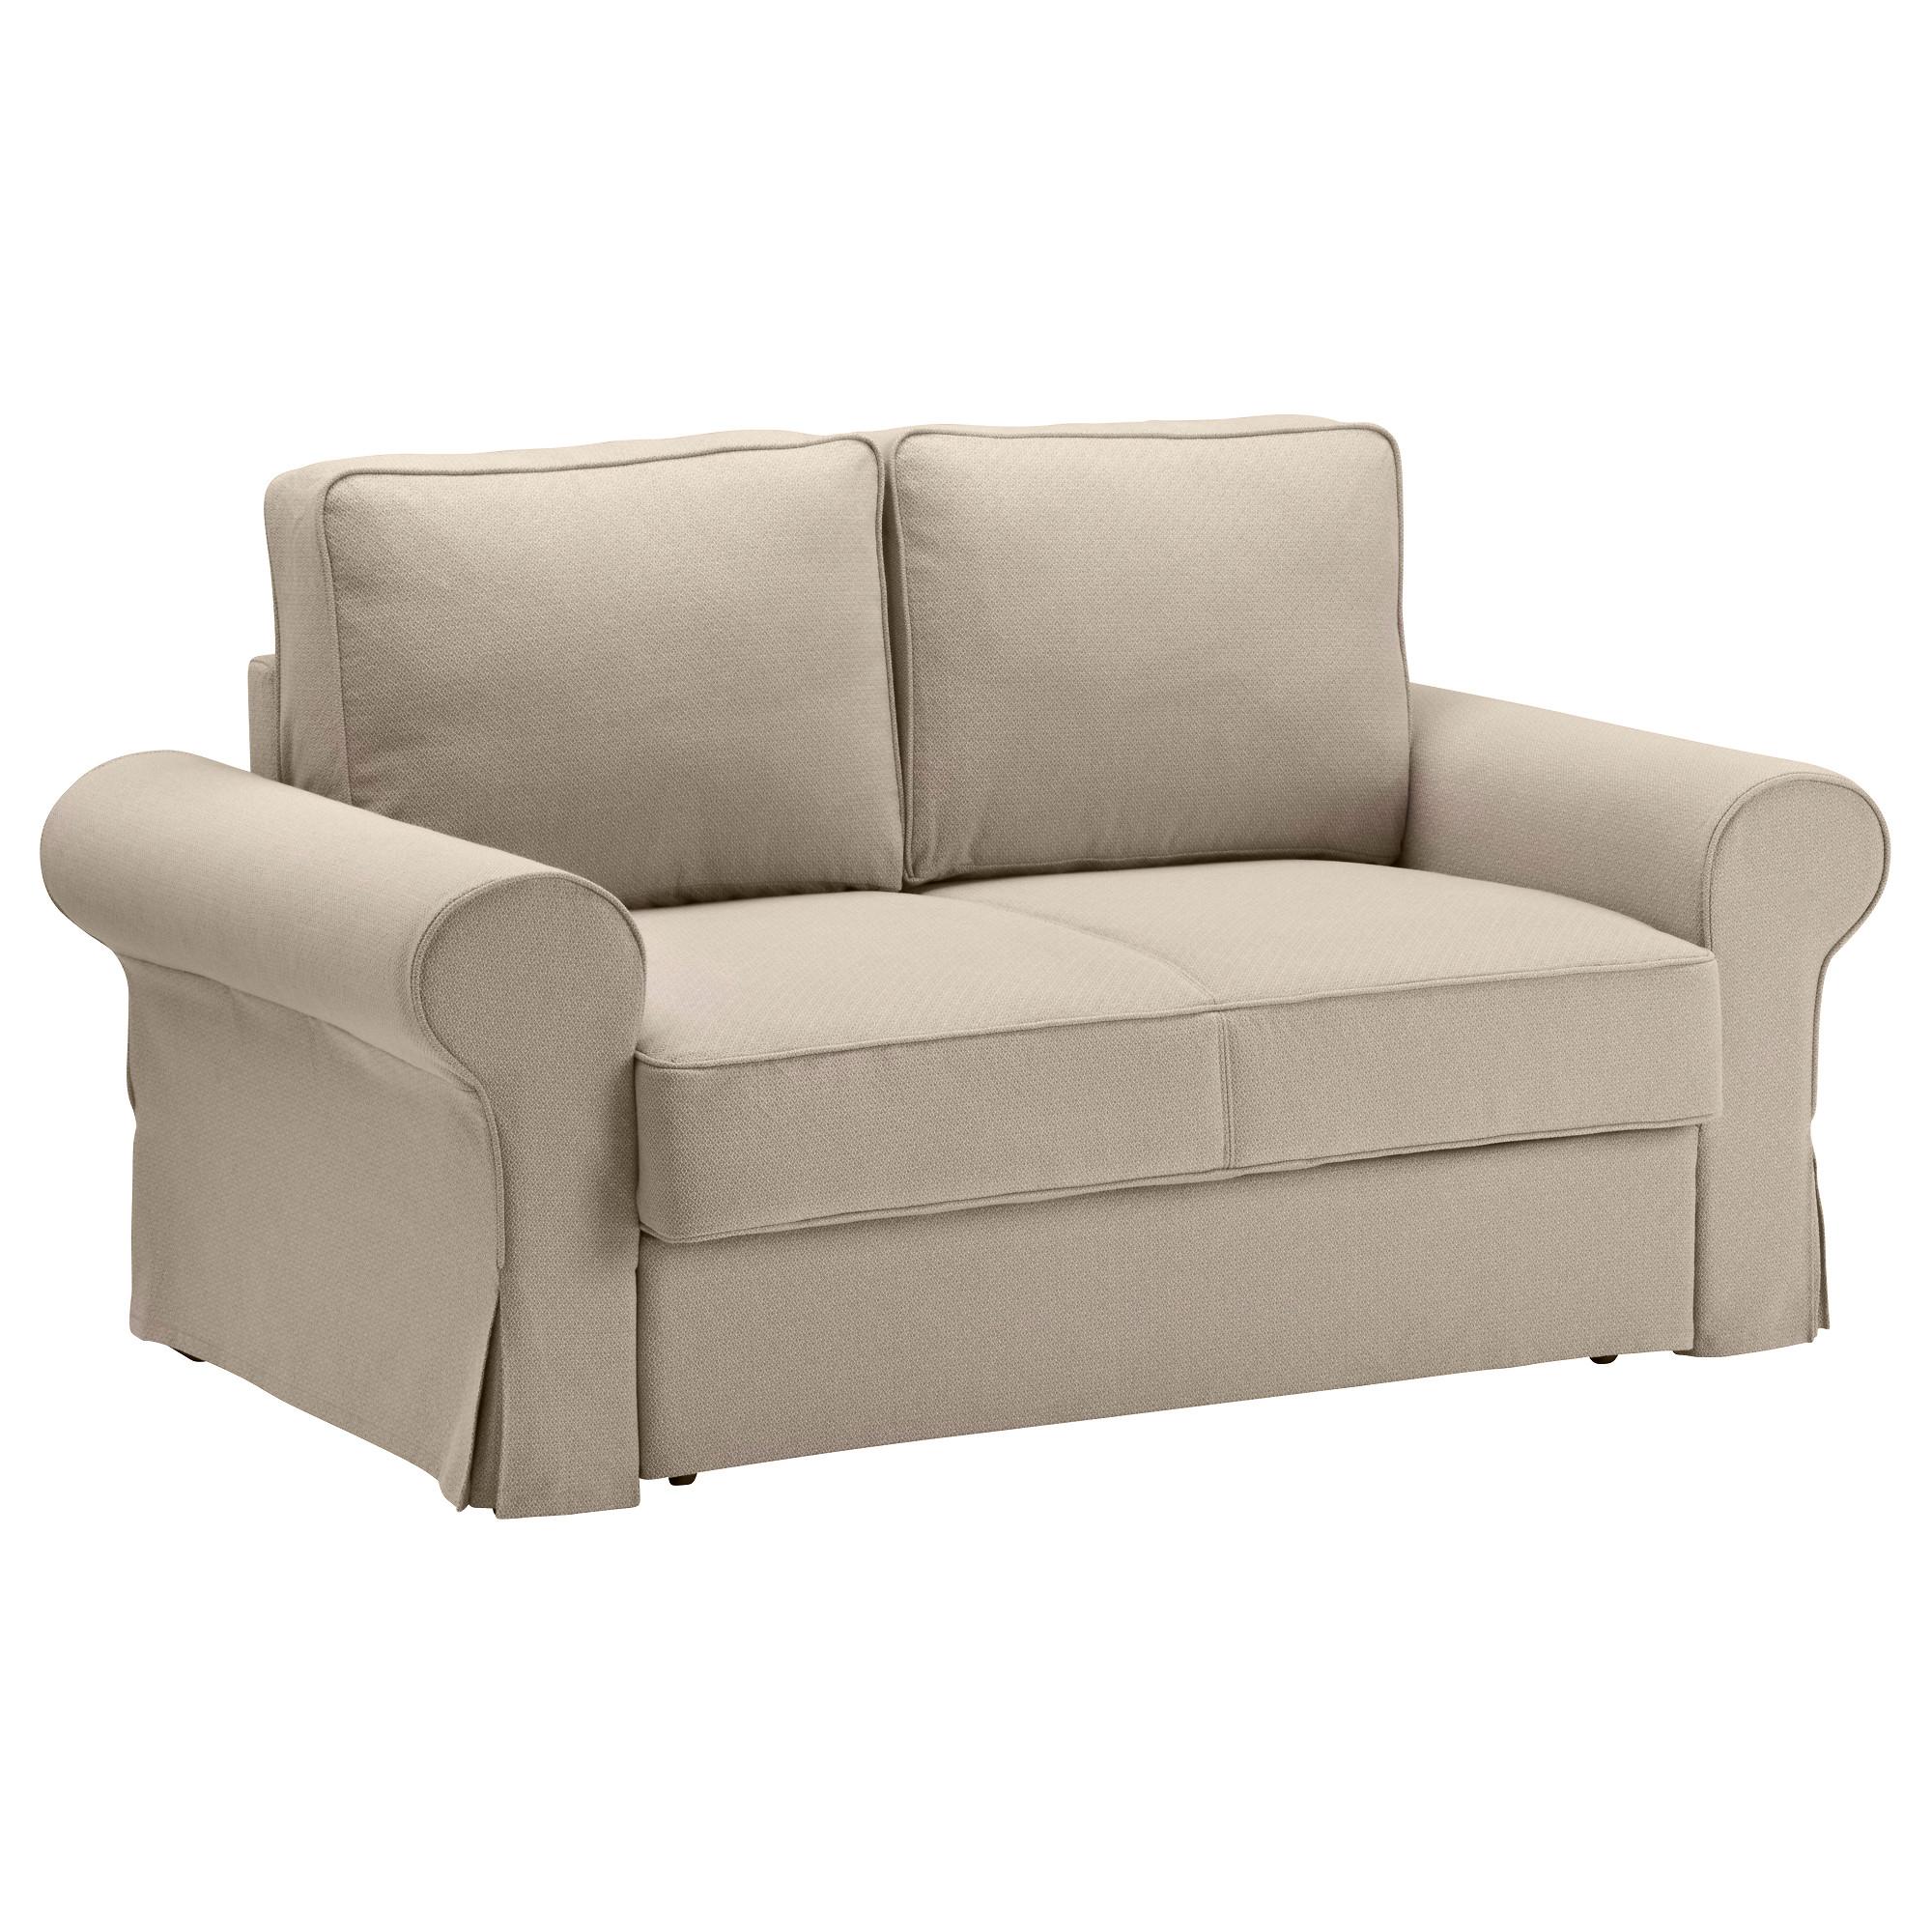 Sillon Cama Barato 87dx sofà S Cama De Calidad Pra Online Ikea